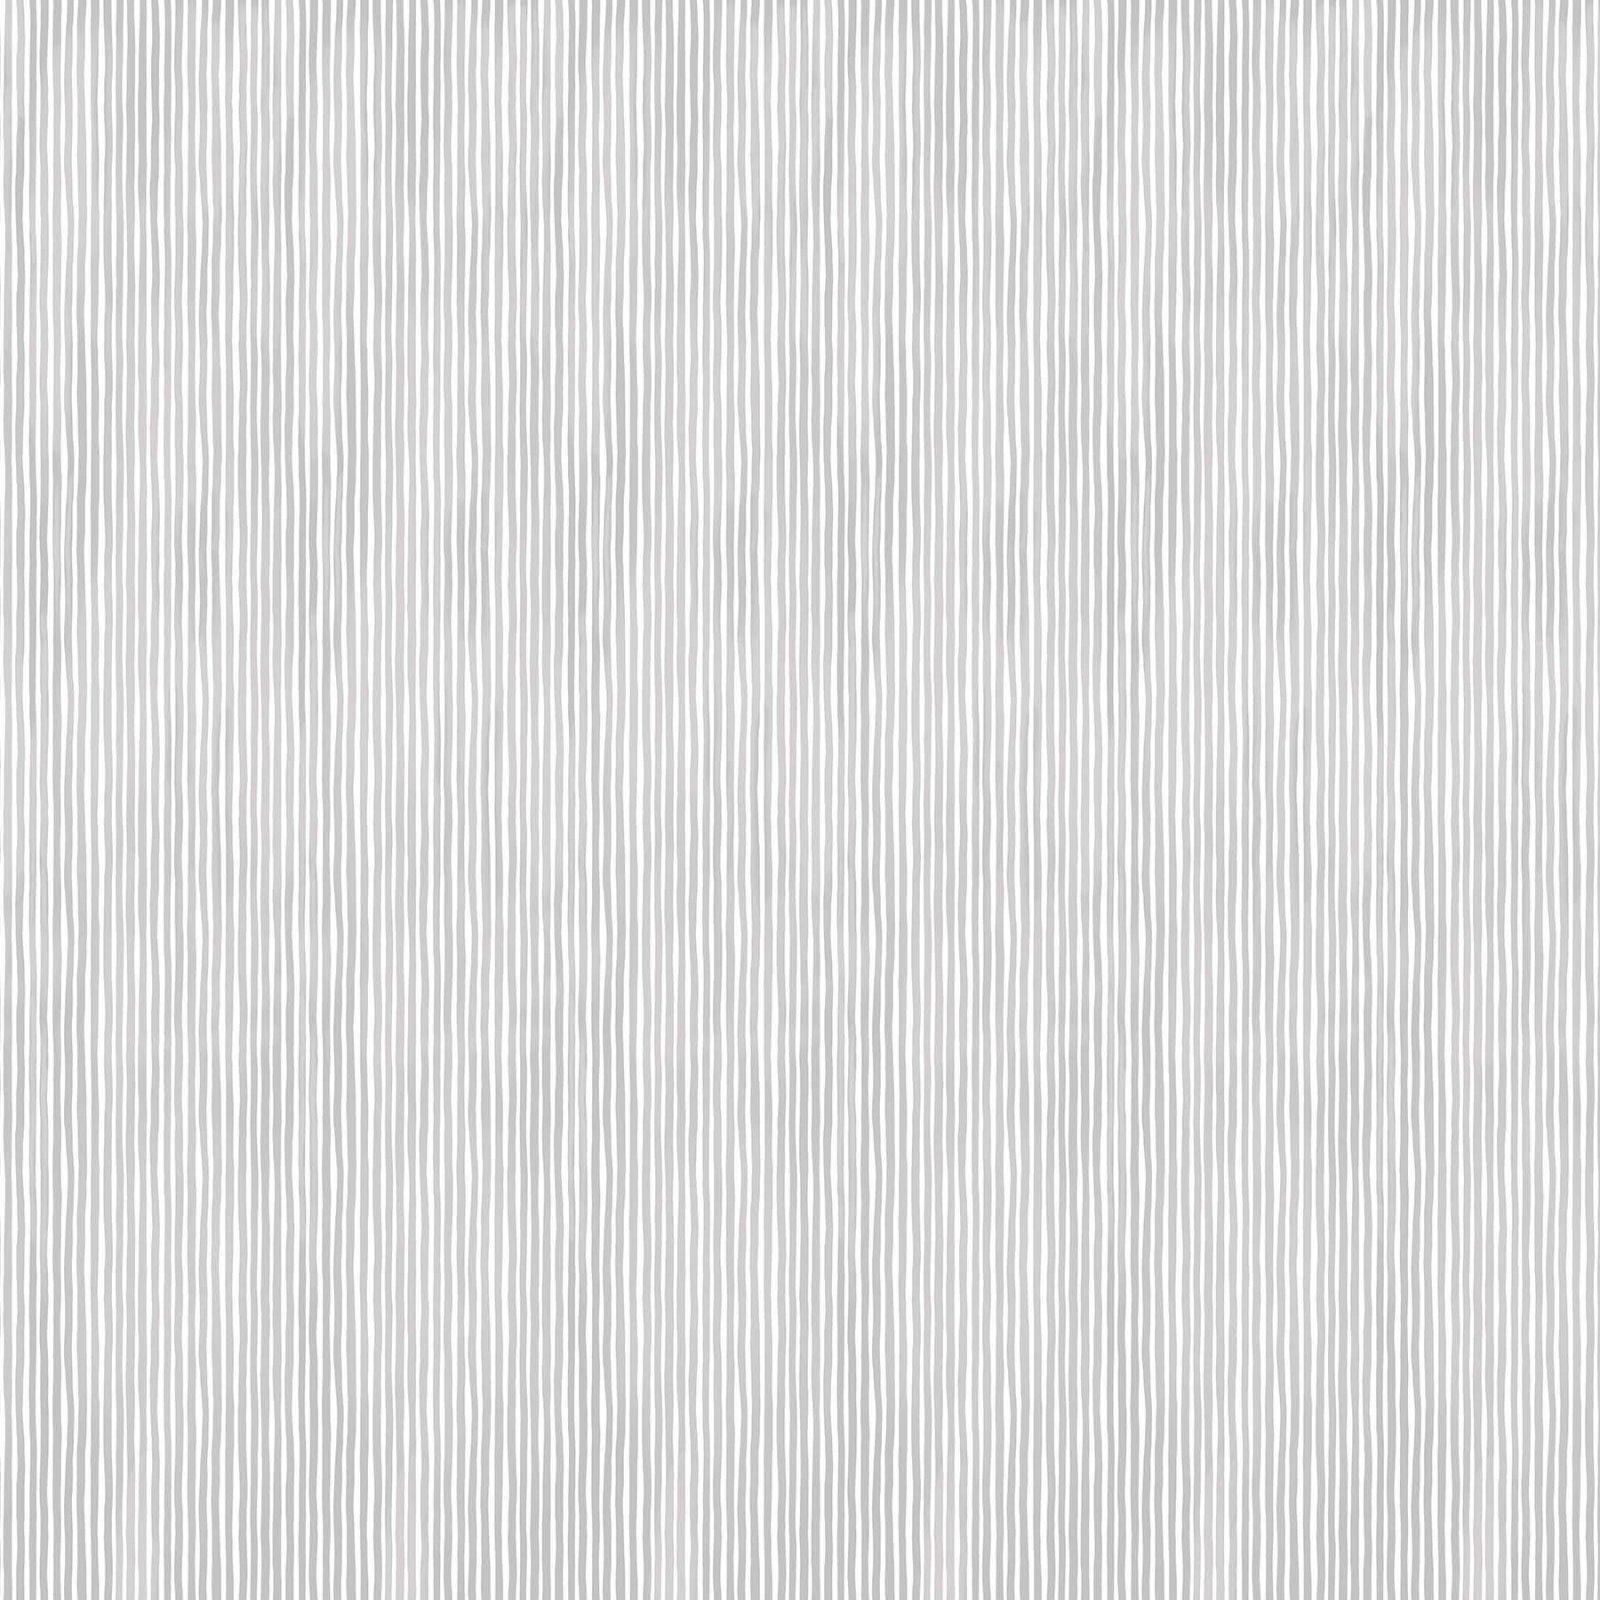 Sew Sweet Gray Stripes